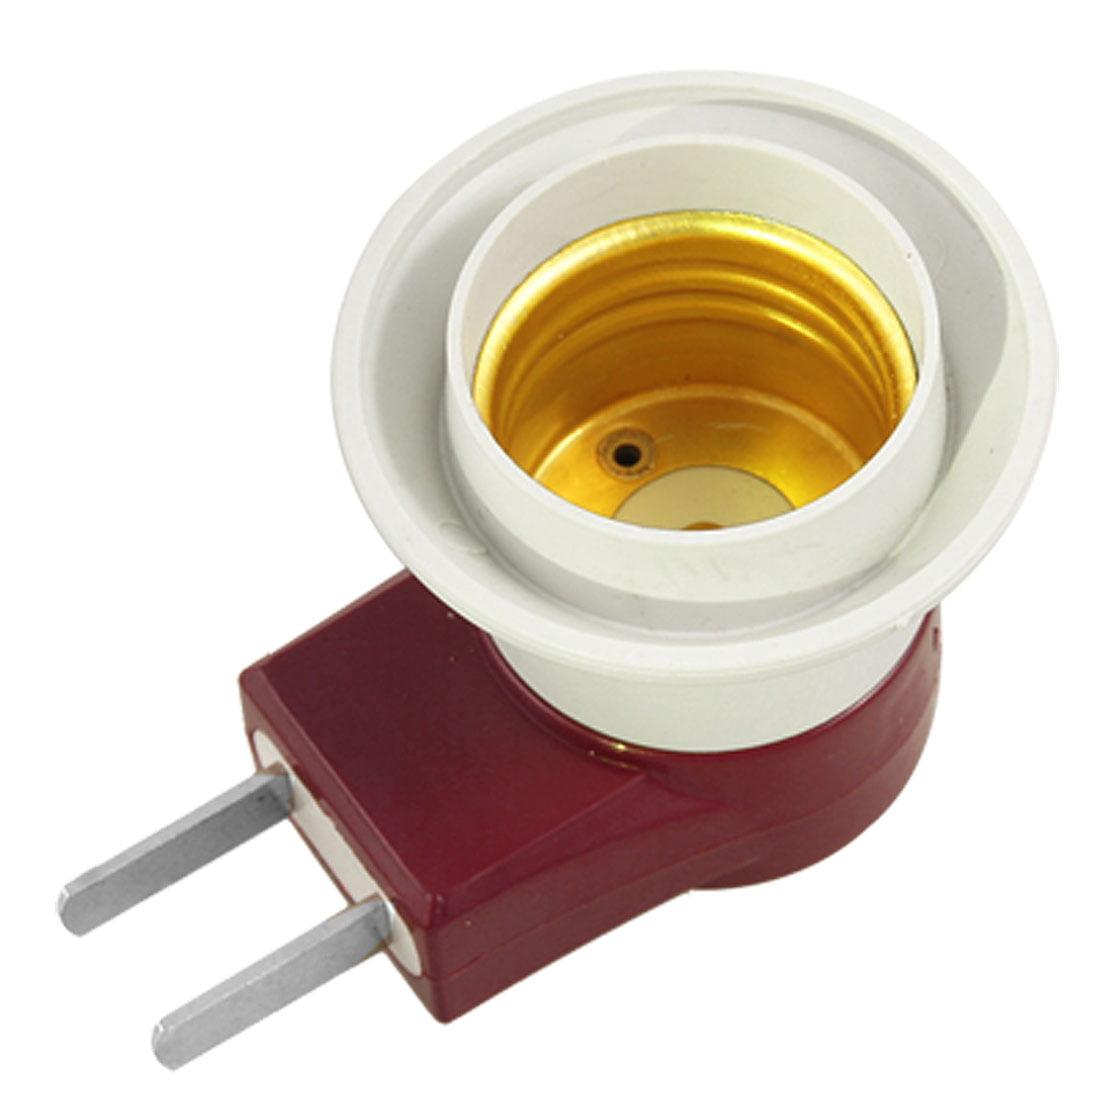 Flat 2 Pin Plug Light Bulb Holder Lamp Socket AC 250V - Walmart.com for Bulb Holder With Plug  5lpkxo